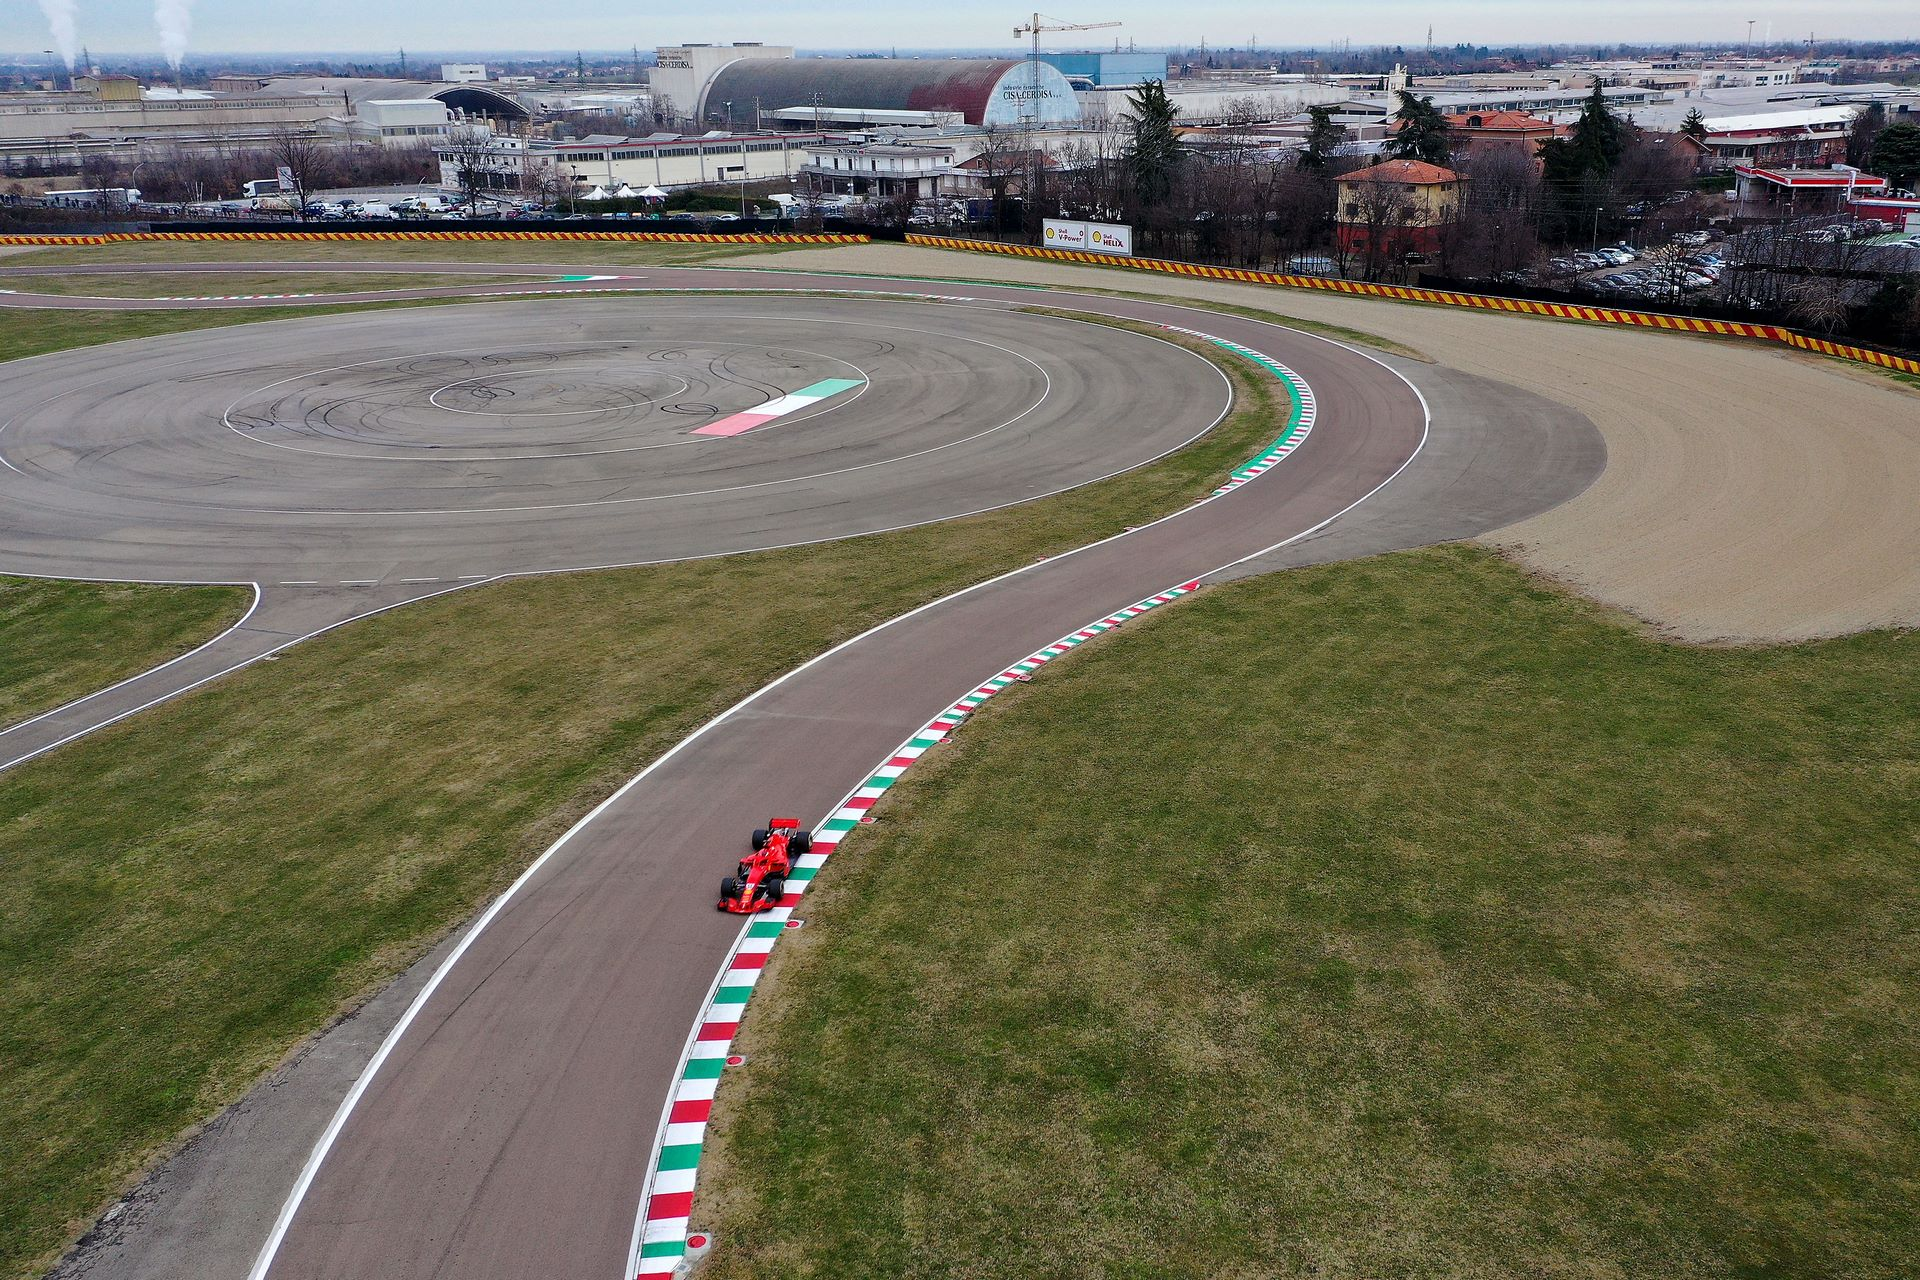 F1 TEST FIORANO - MERCOLEDì  27/01/21